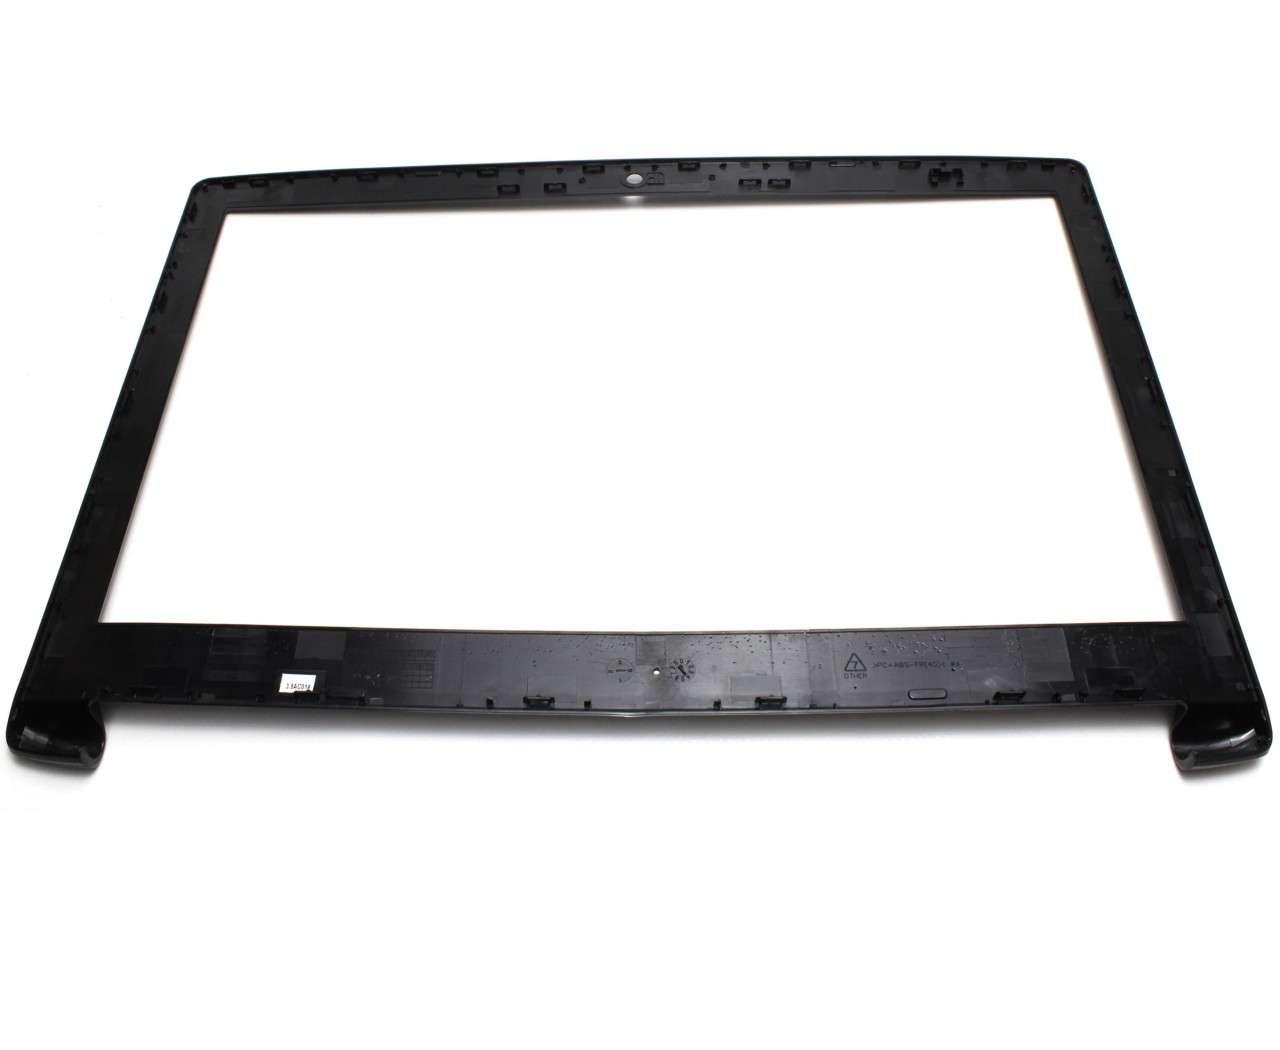 Rama Display Acer 60.GY9N2.003 Bezel Front Cover Neagra imagine powerlaptop.ro 2021